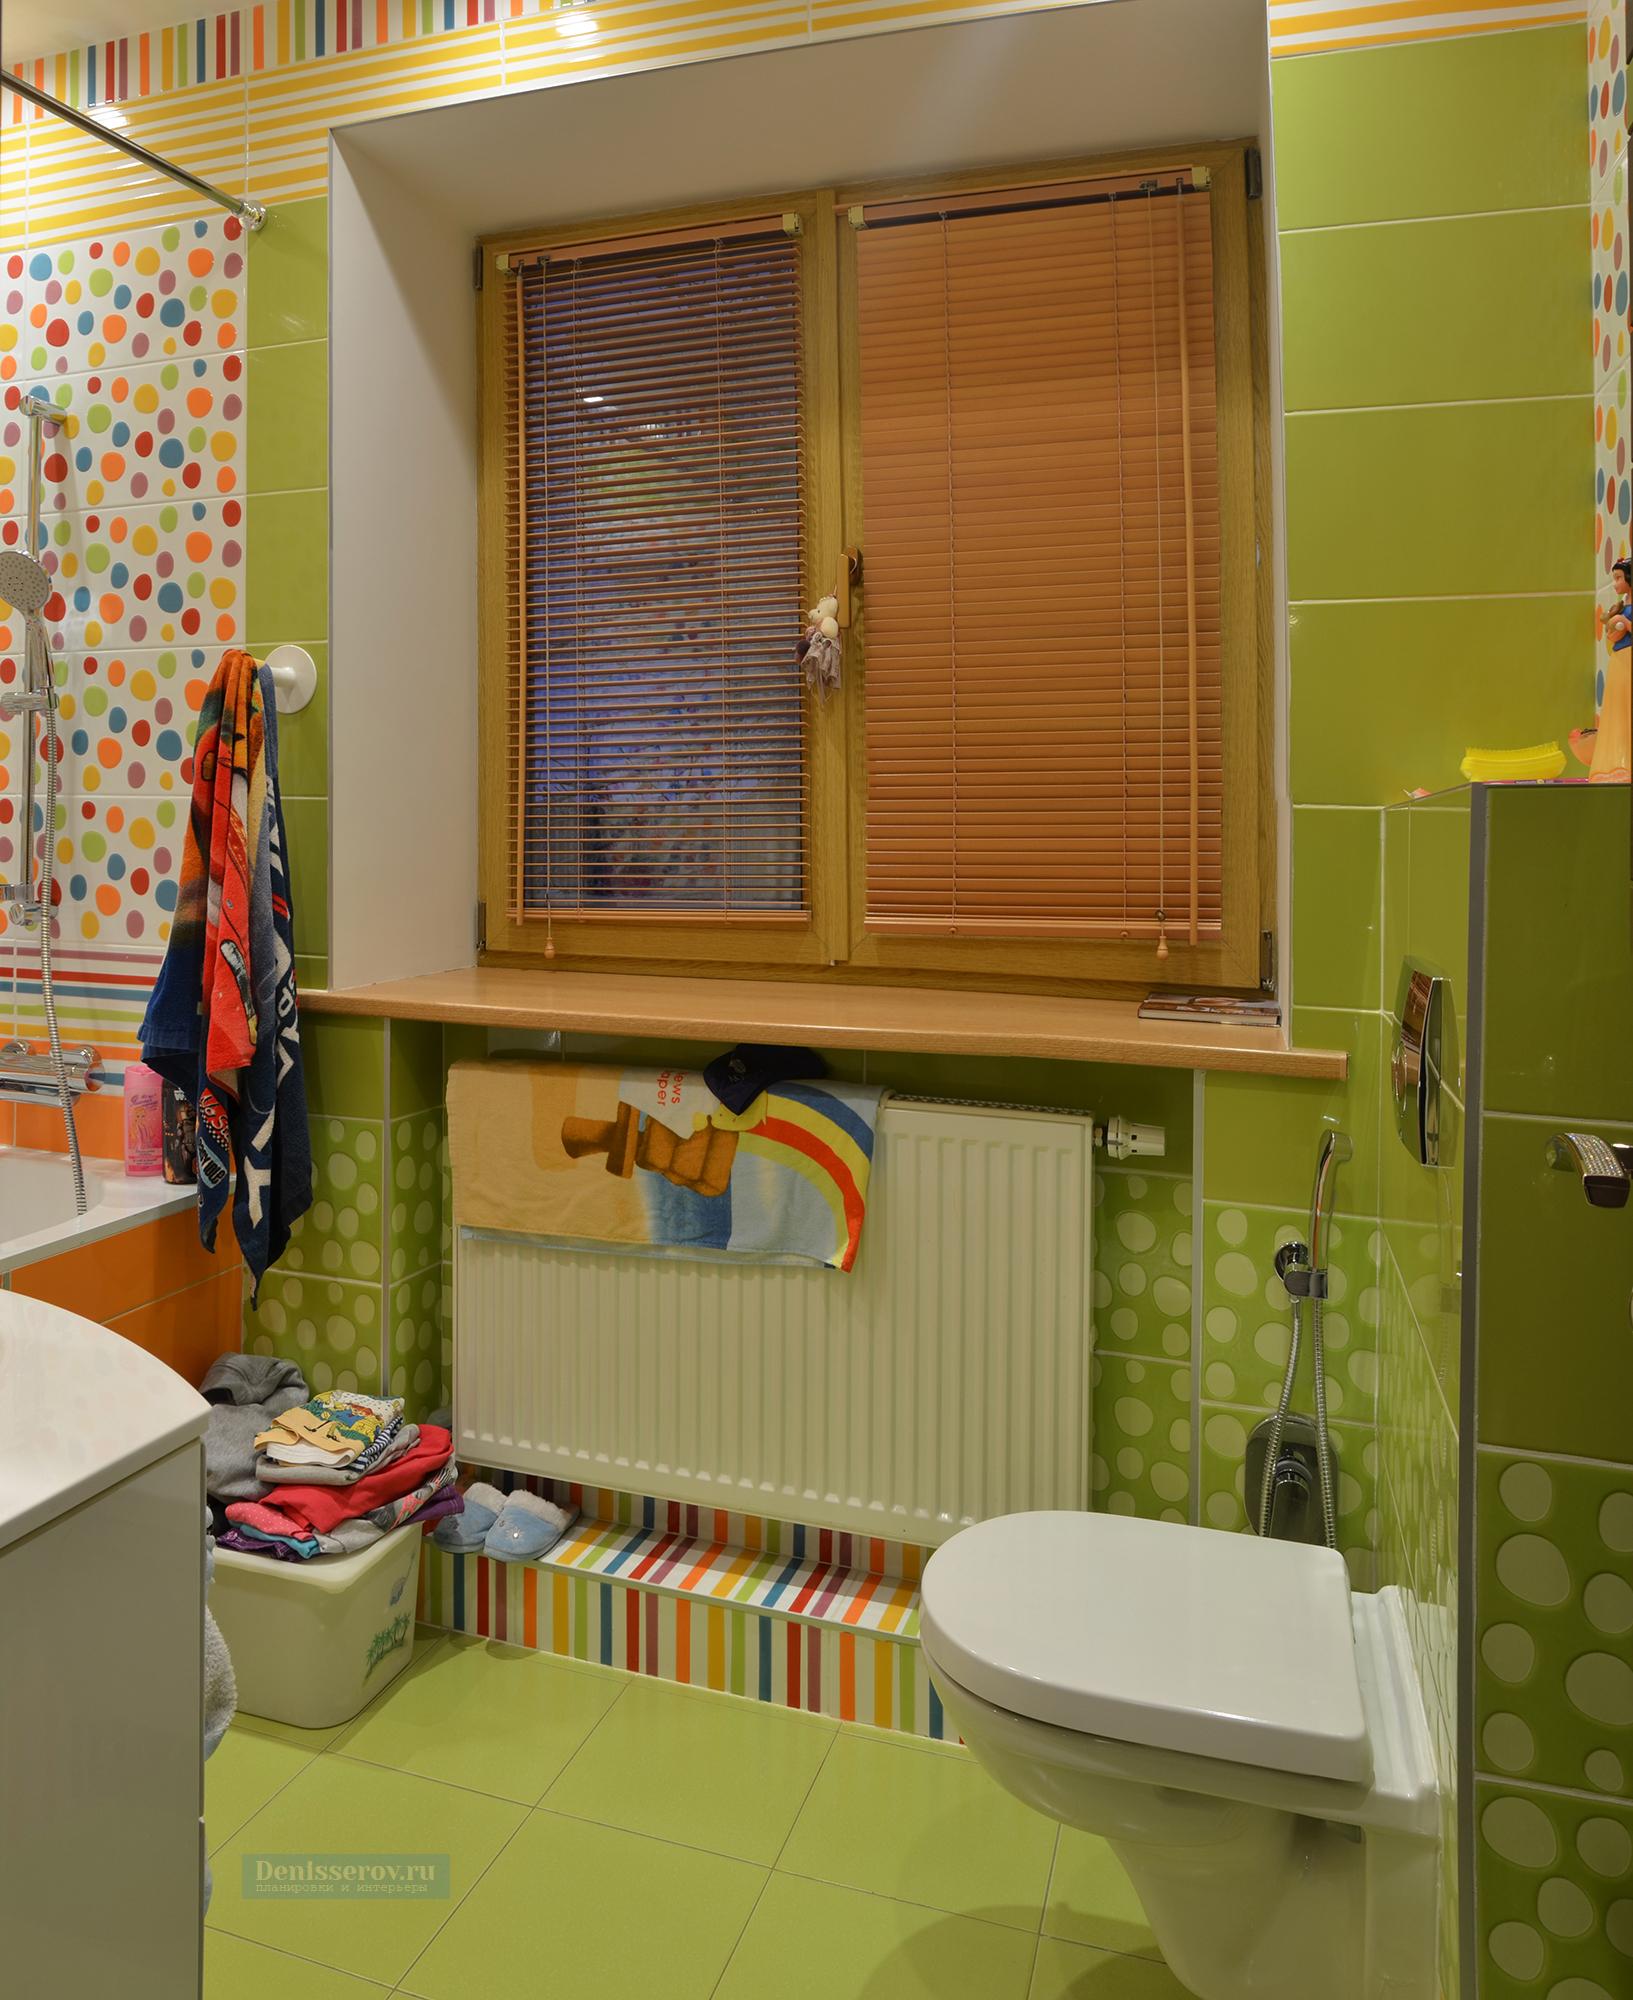 Dizajn-detskoj-vannoj-komnaty-v-zelenom-cvete-3